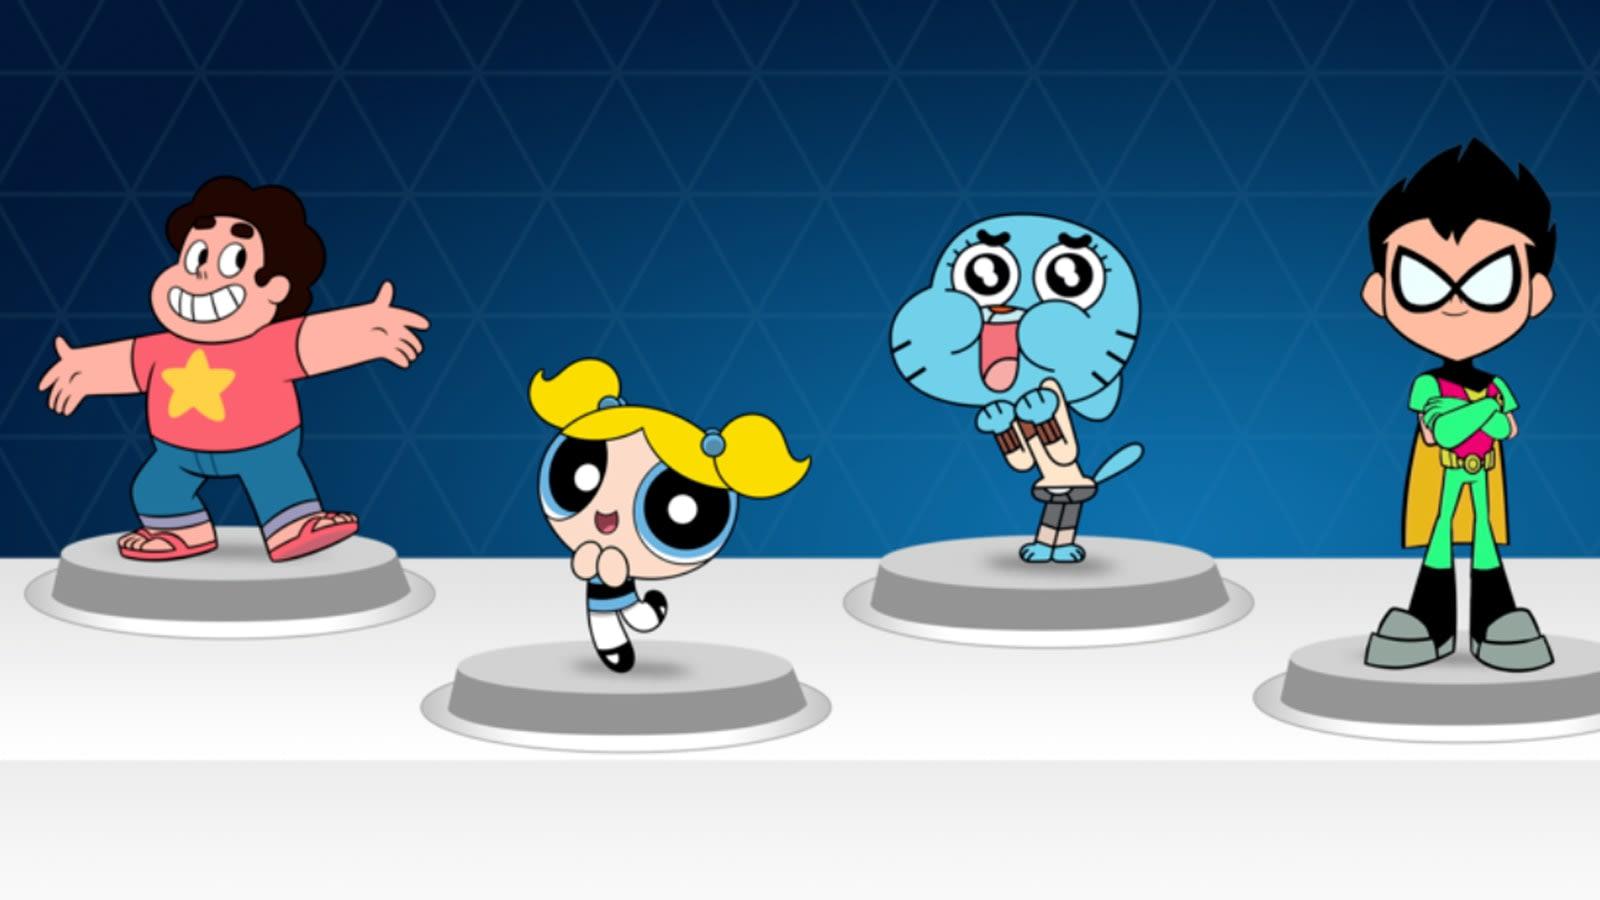 Cartoon Network App Rewards Tv Viewing With Virtual